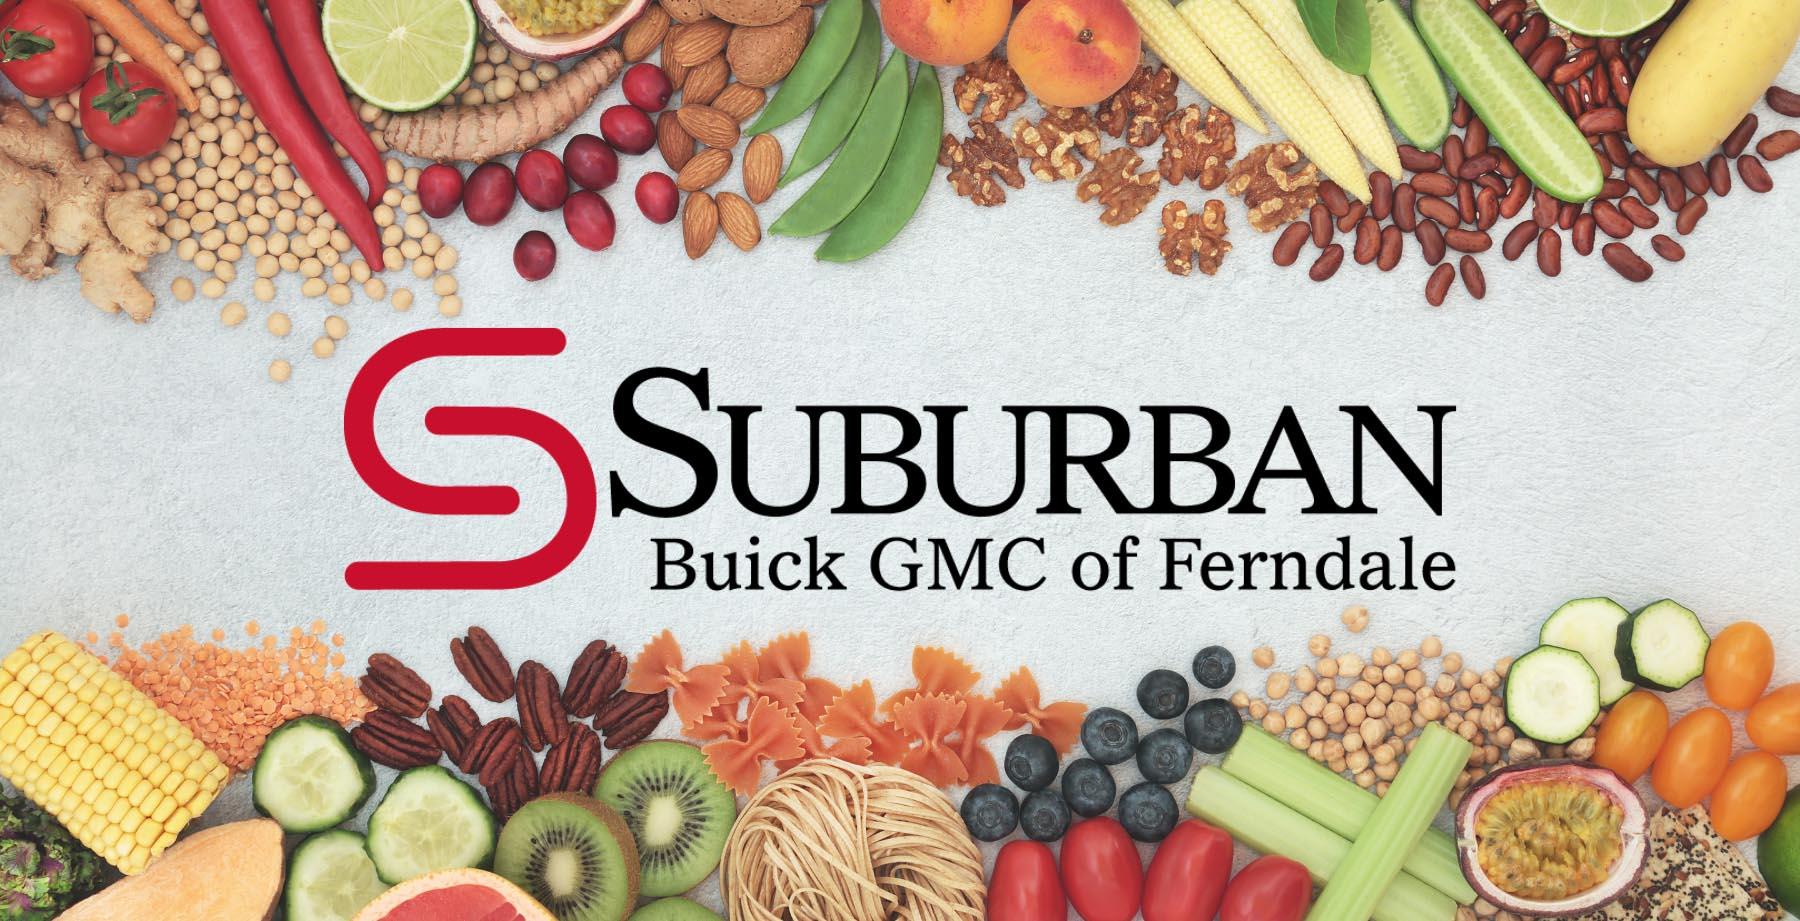 Suburban Buick GMC of Ferndale